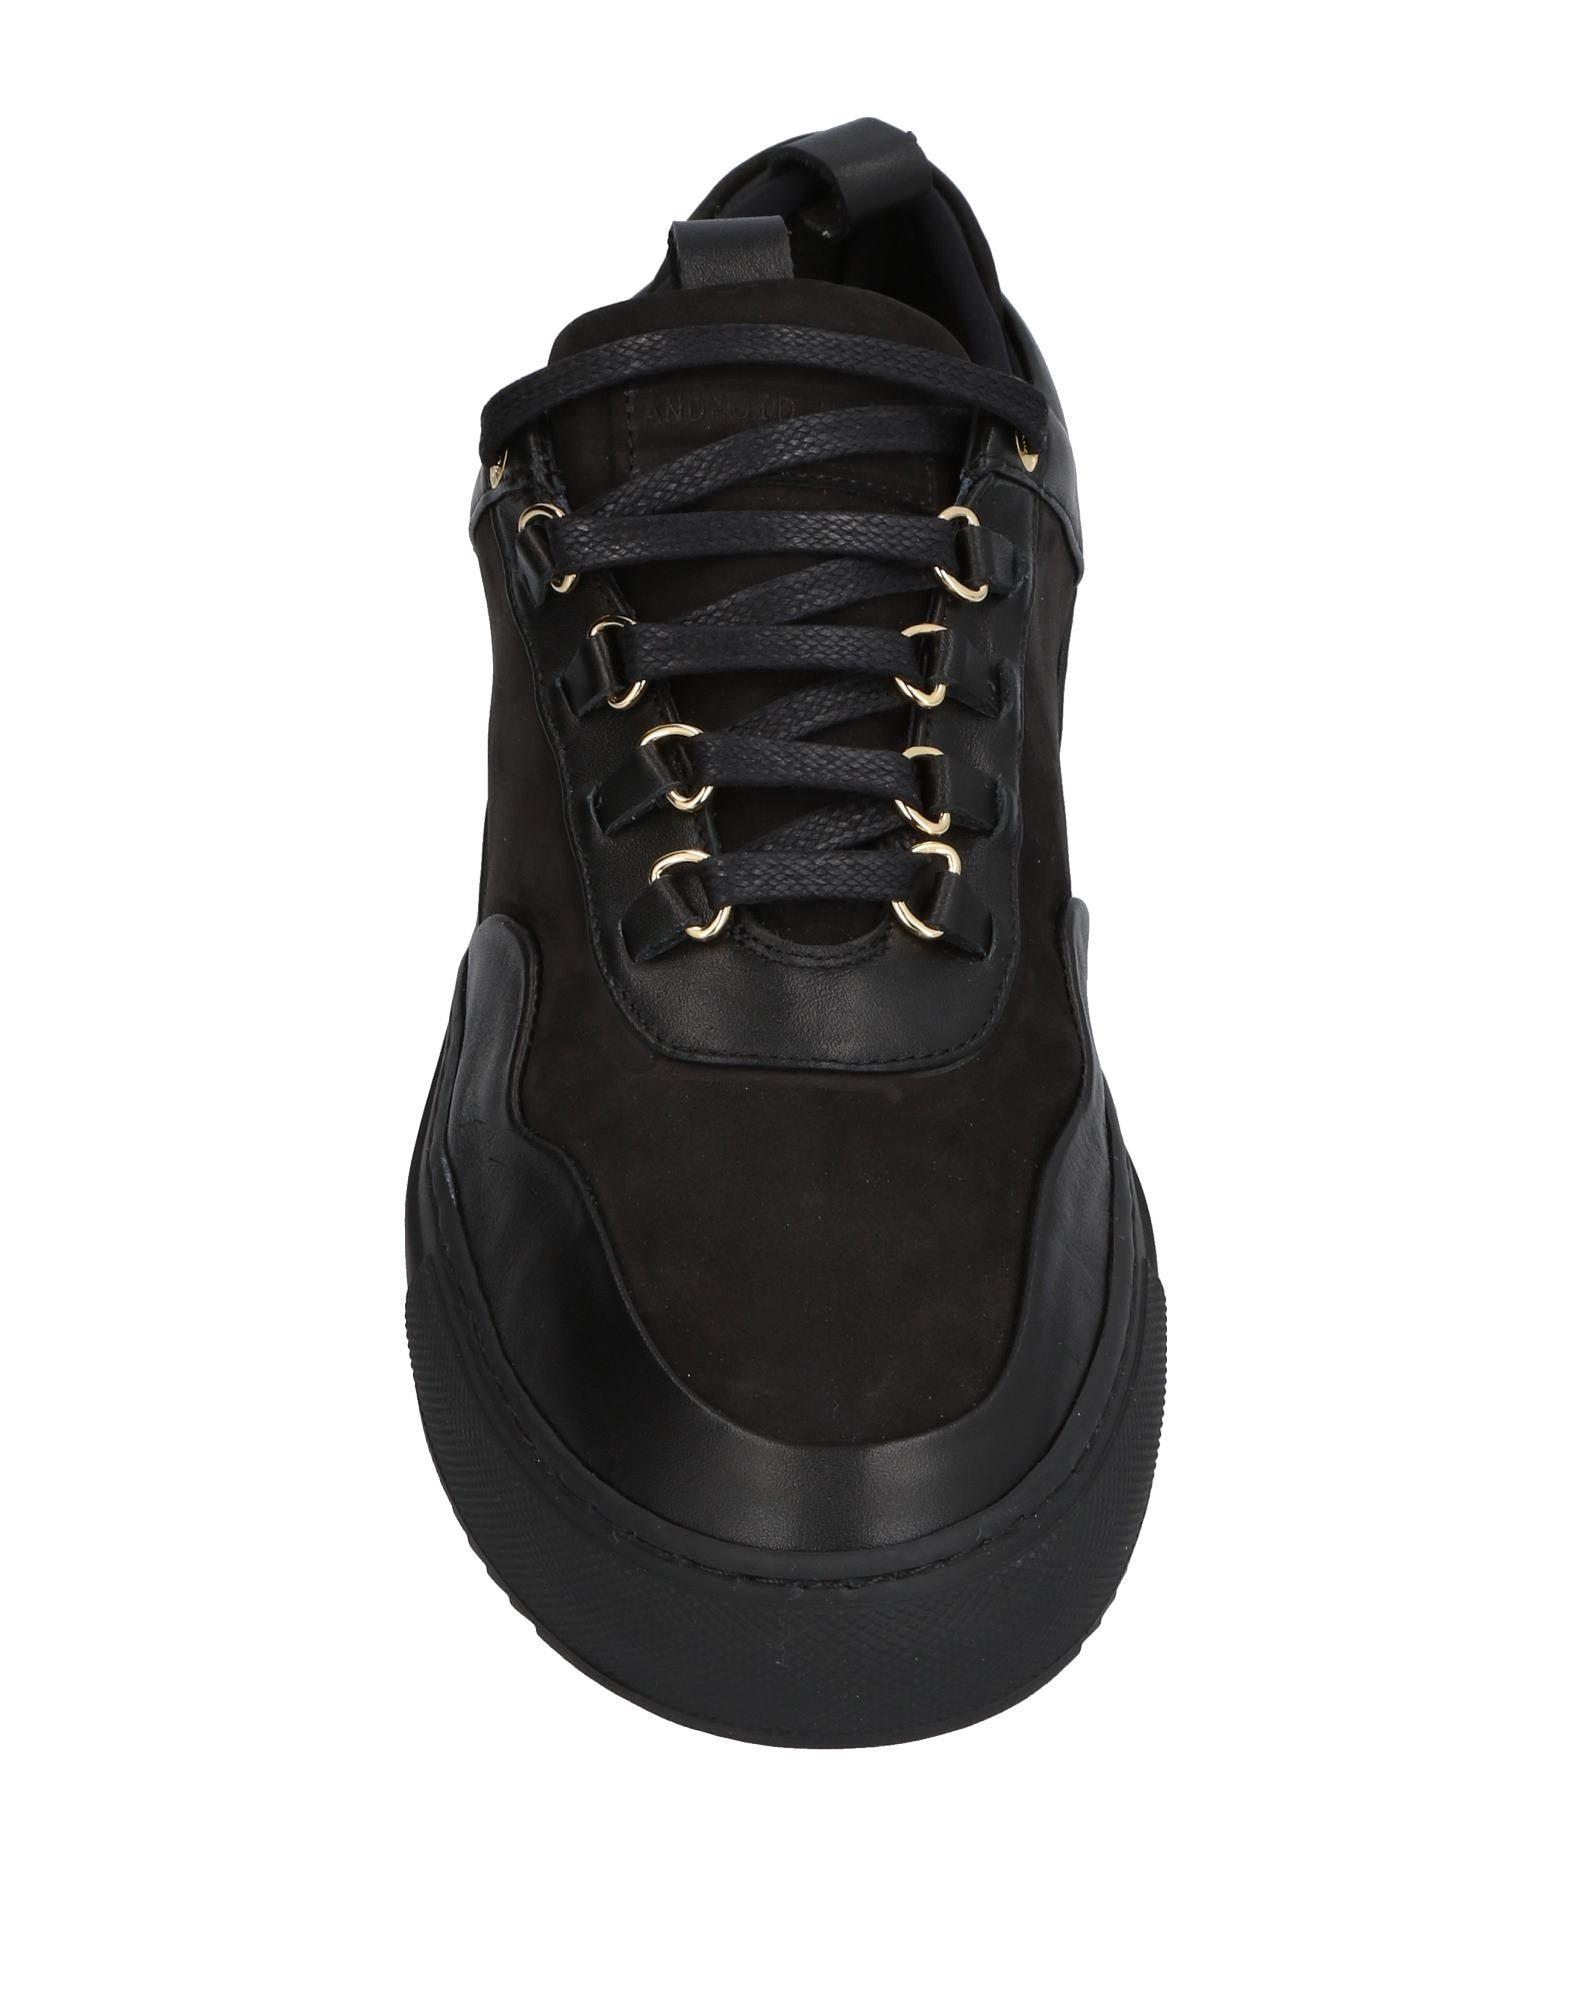 Android Homme Schuhe Sneakers Herren  11423234SW Neue Schuhe Homme 7646e7